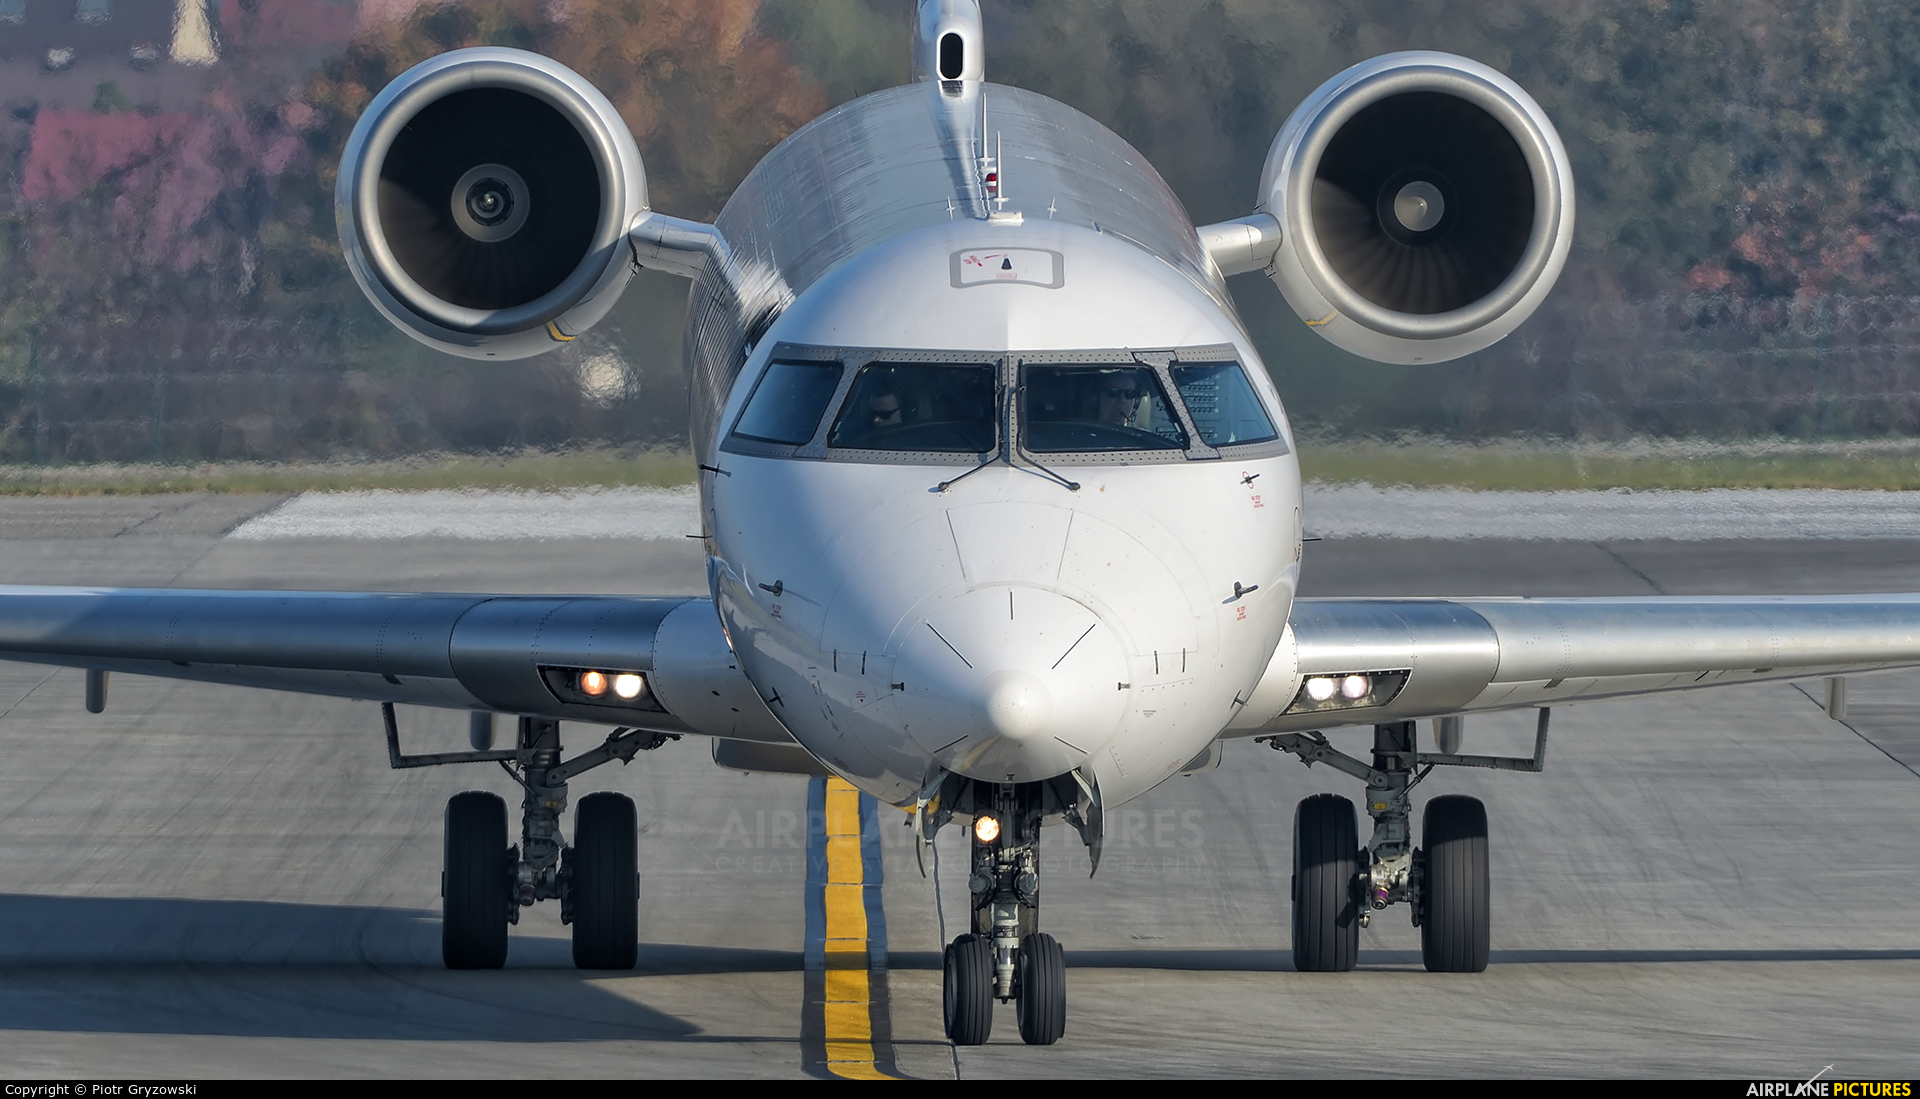 Lufthansa Regional - CityLine D-ACNC aircraft at Kraków - John Paul II Intl